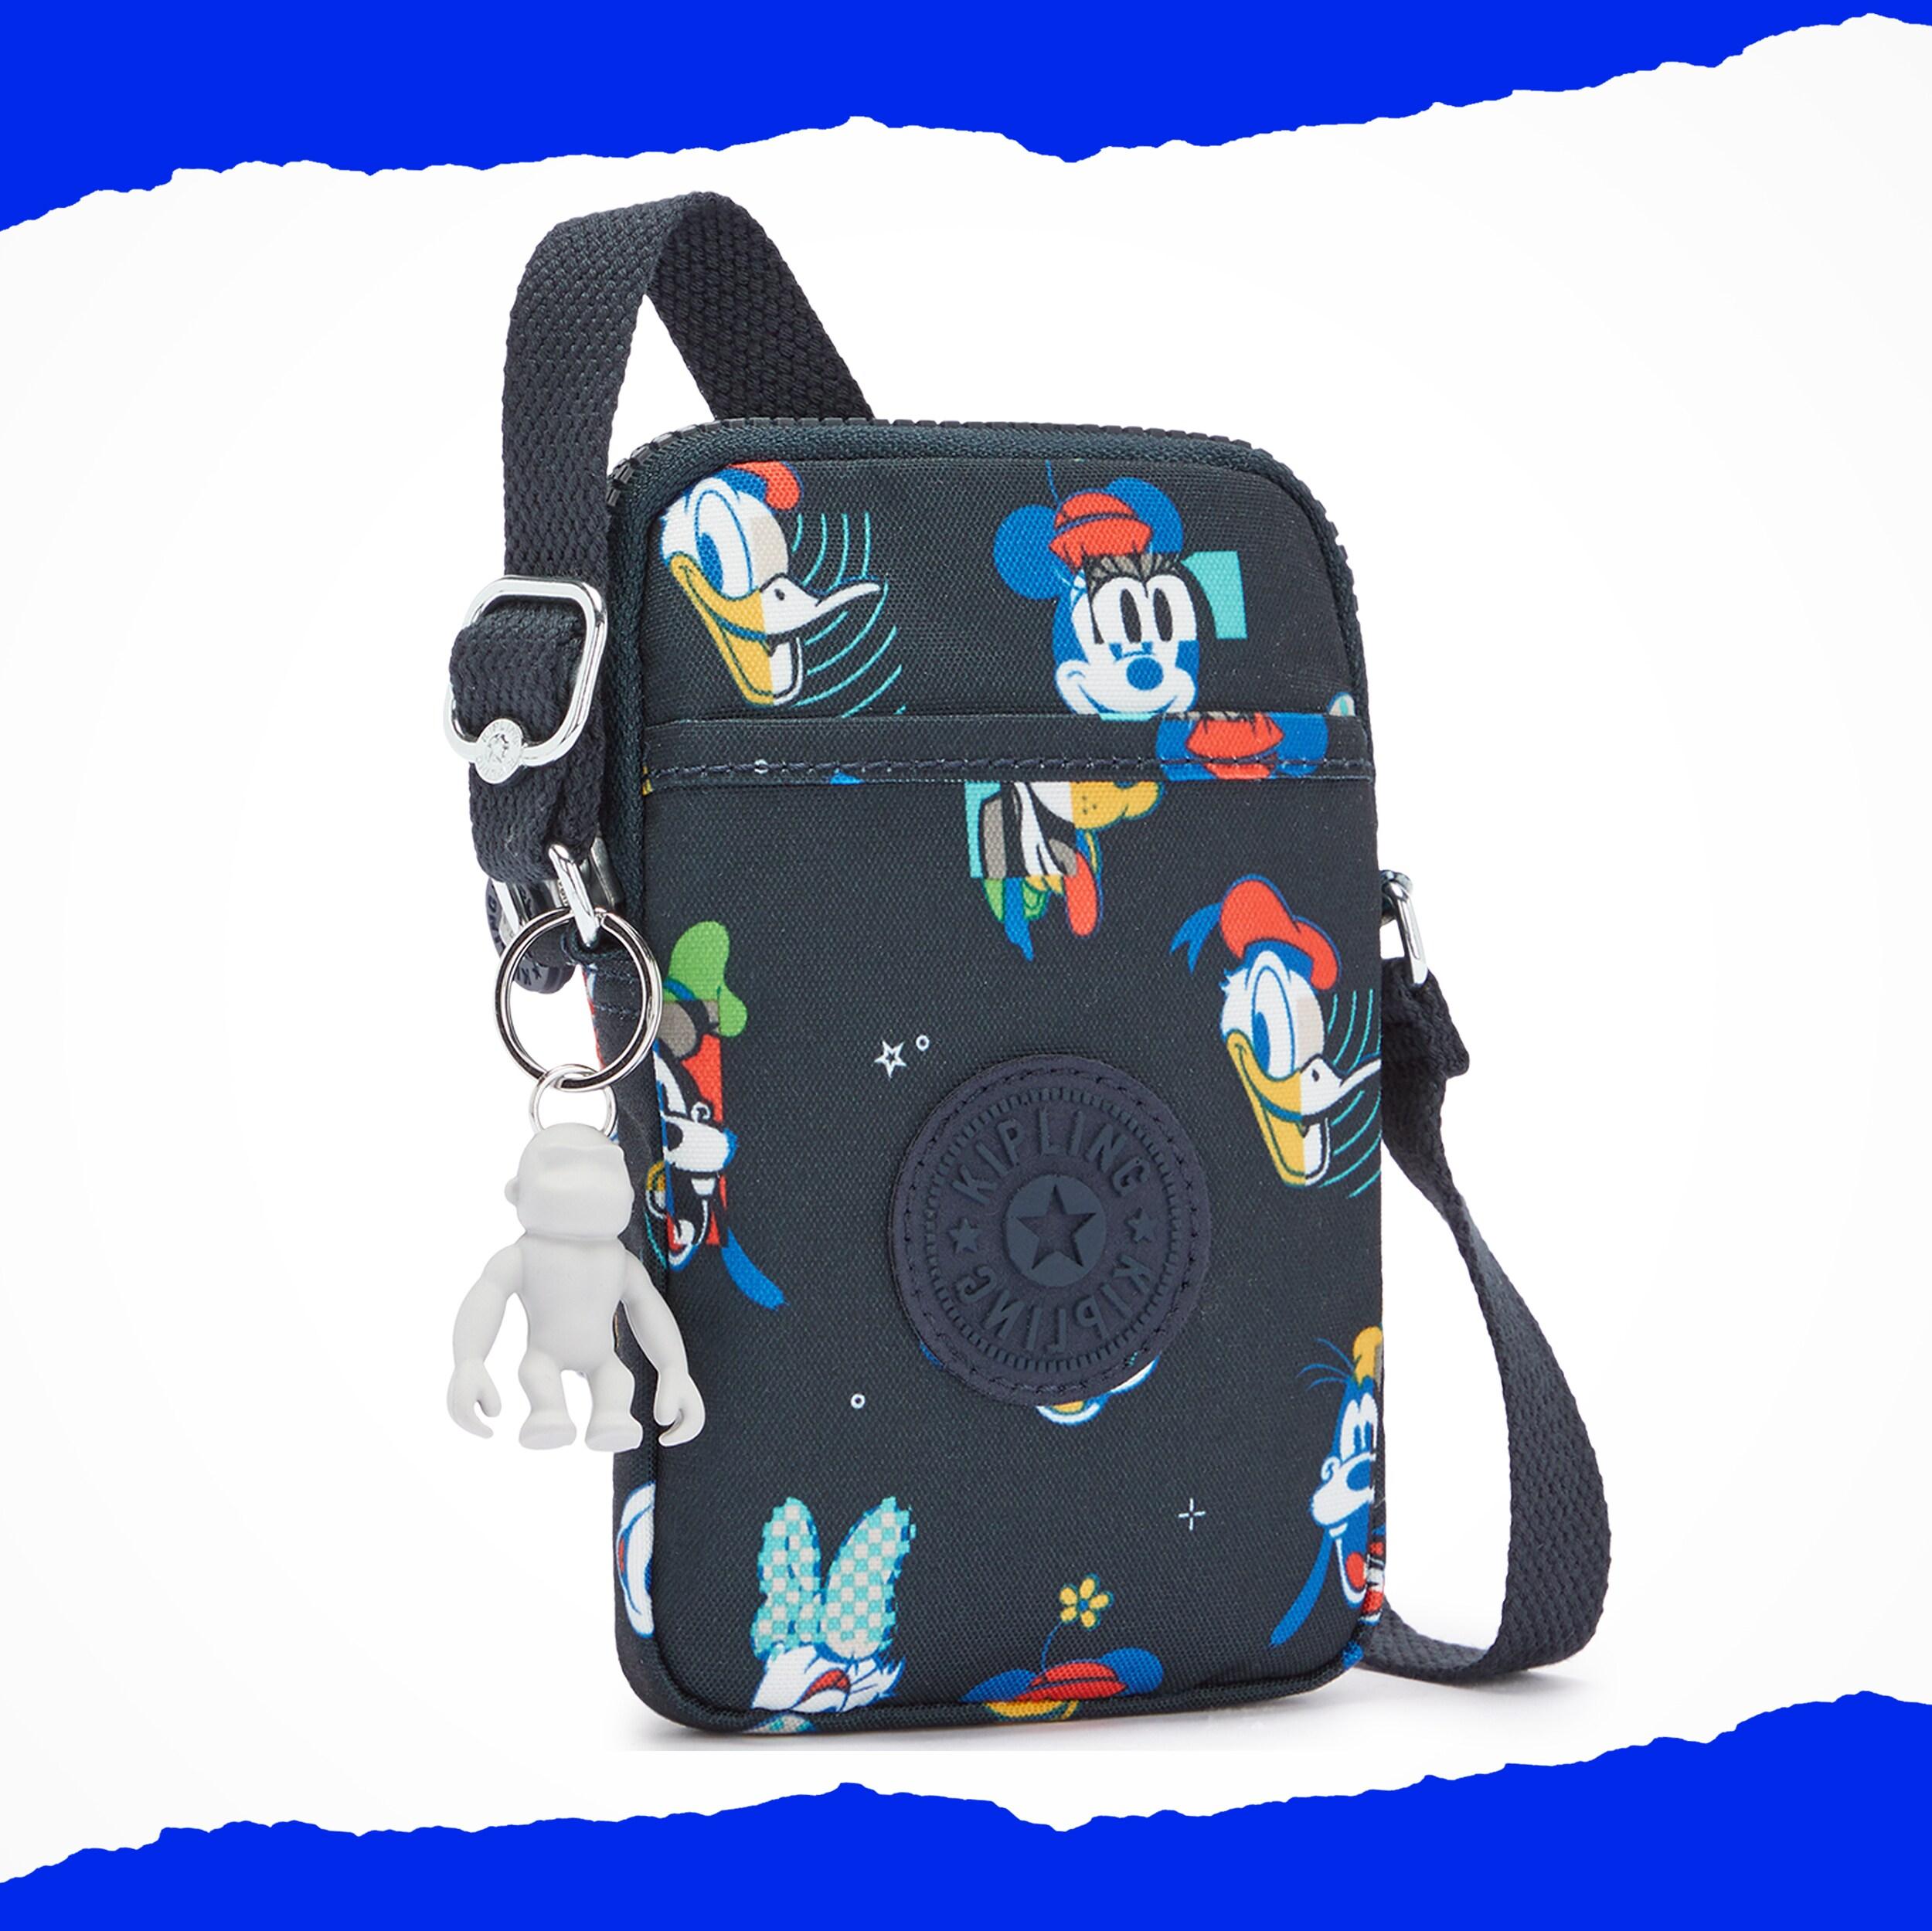 Mickey & Friends Tally Phone Bag